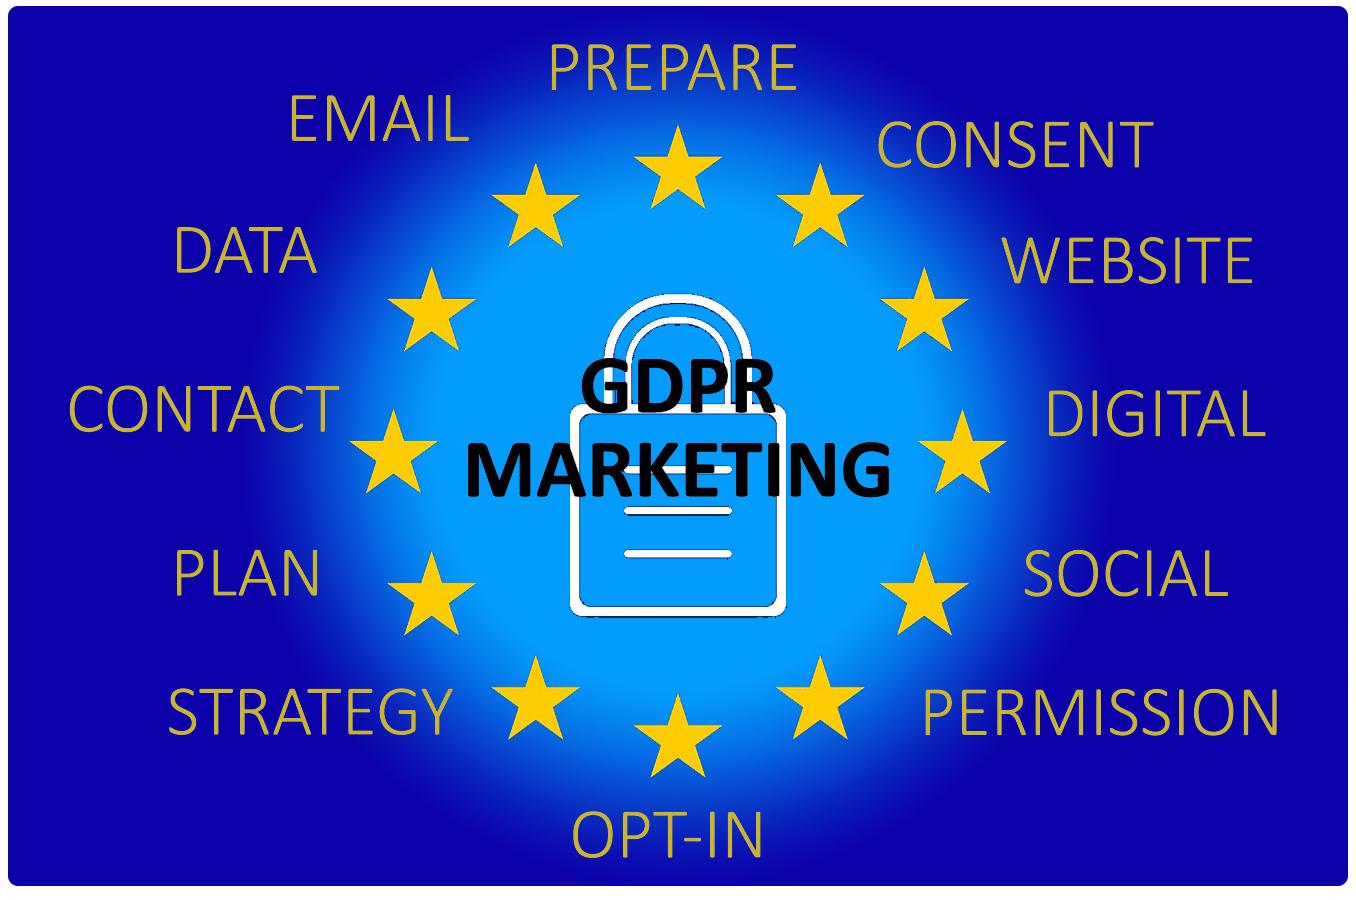 GDPR Marketing Preparation